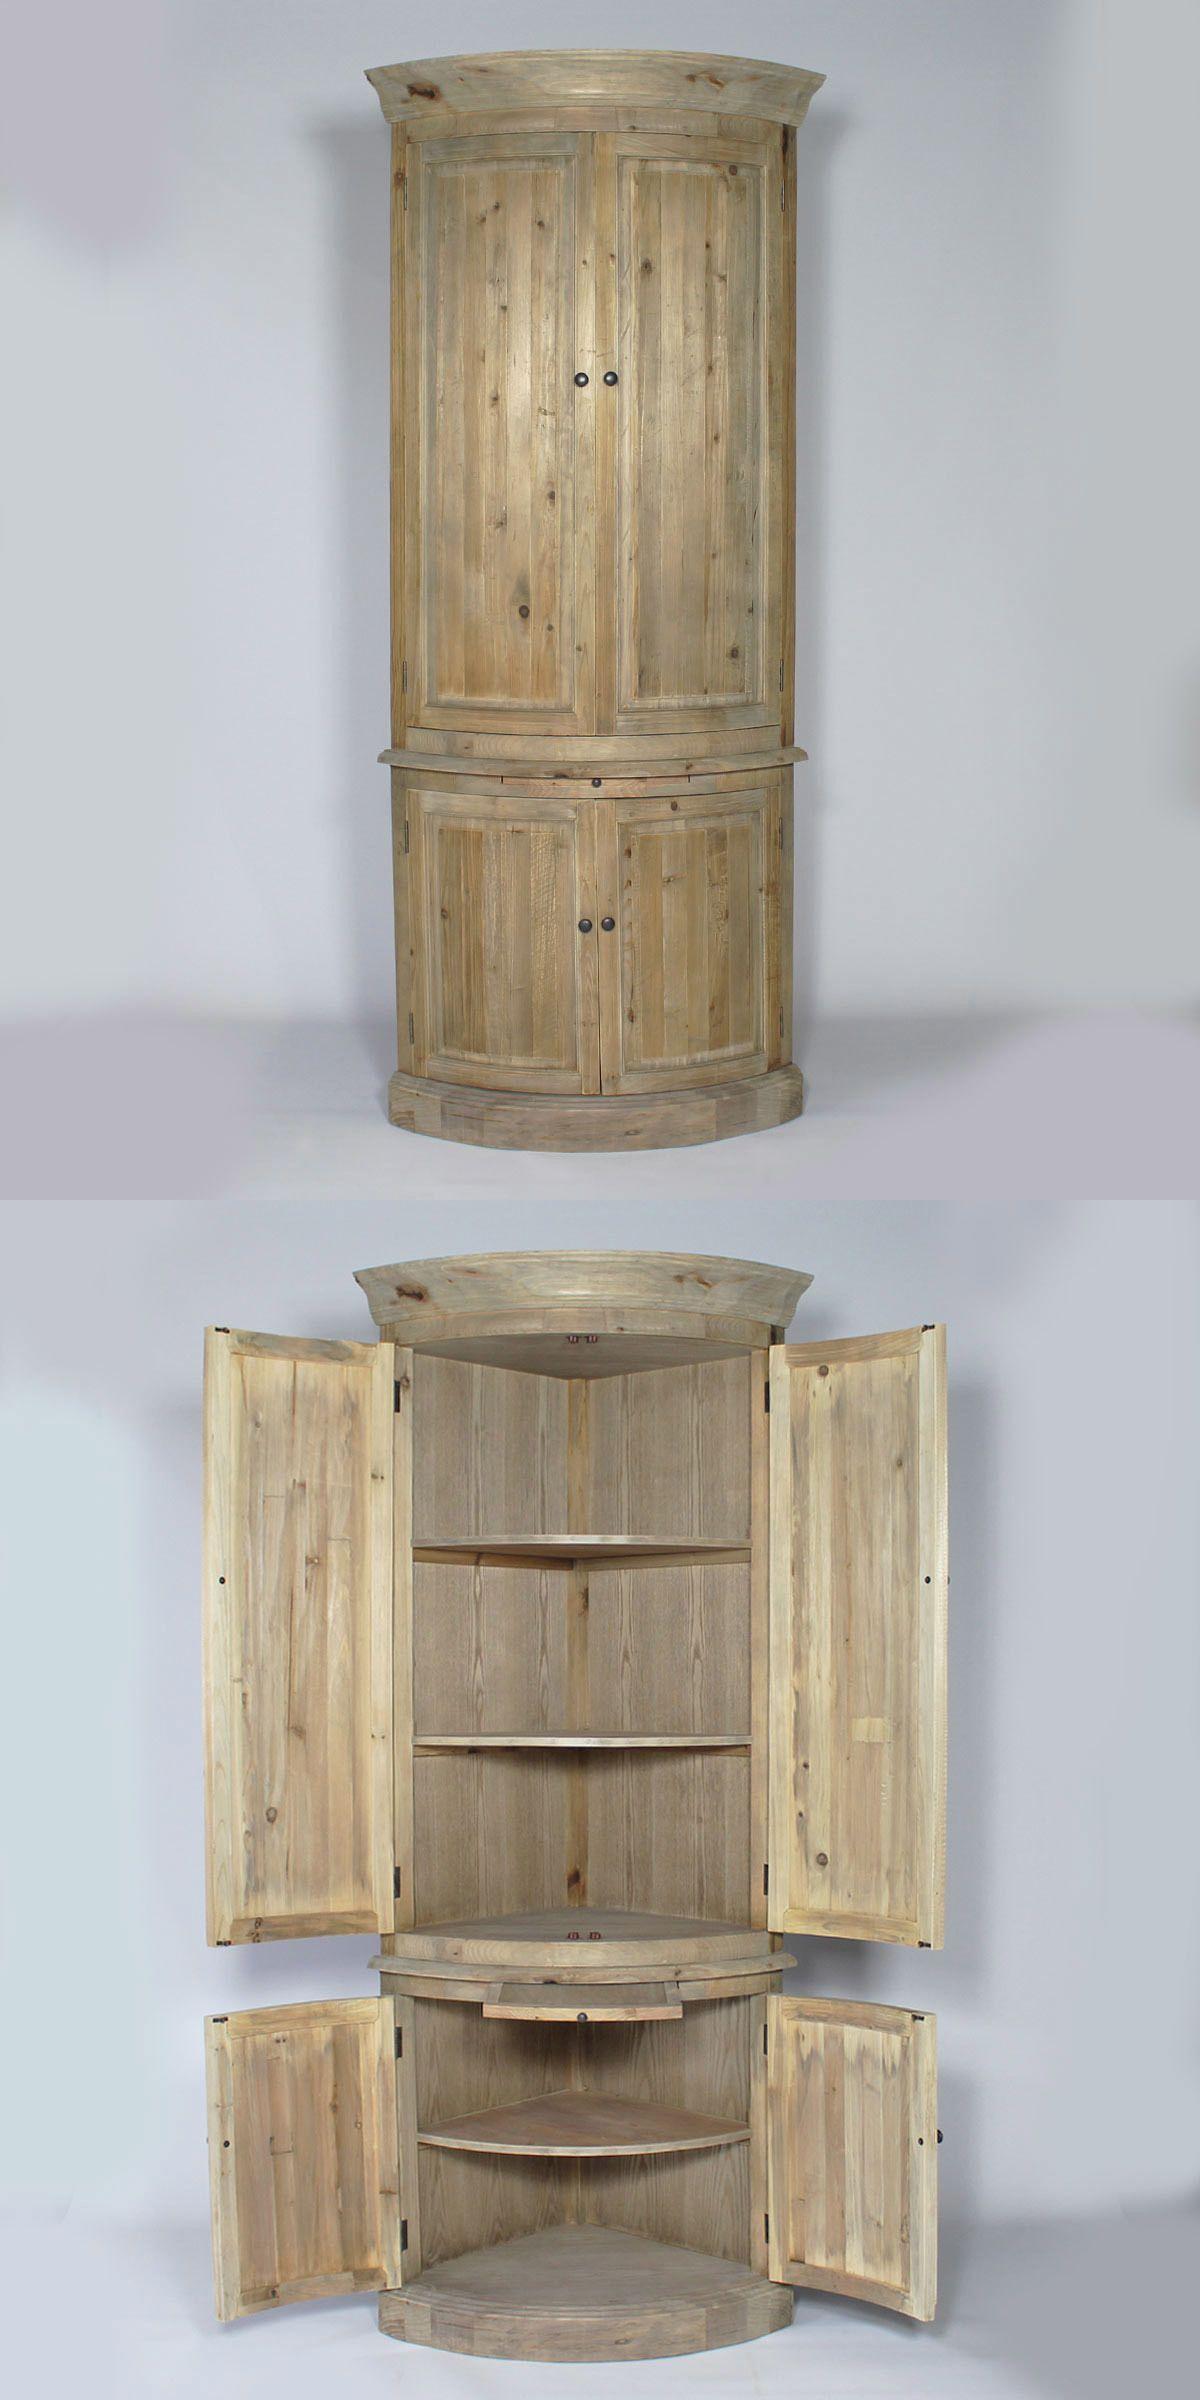 Buffet D Angle En Pin Massif Recycle 4 Portes 3 Etageres Meuble D Angle Mobilier De Salon Meuble Bois Recycle